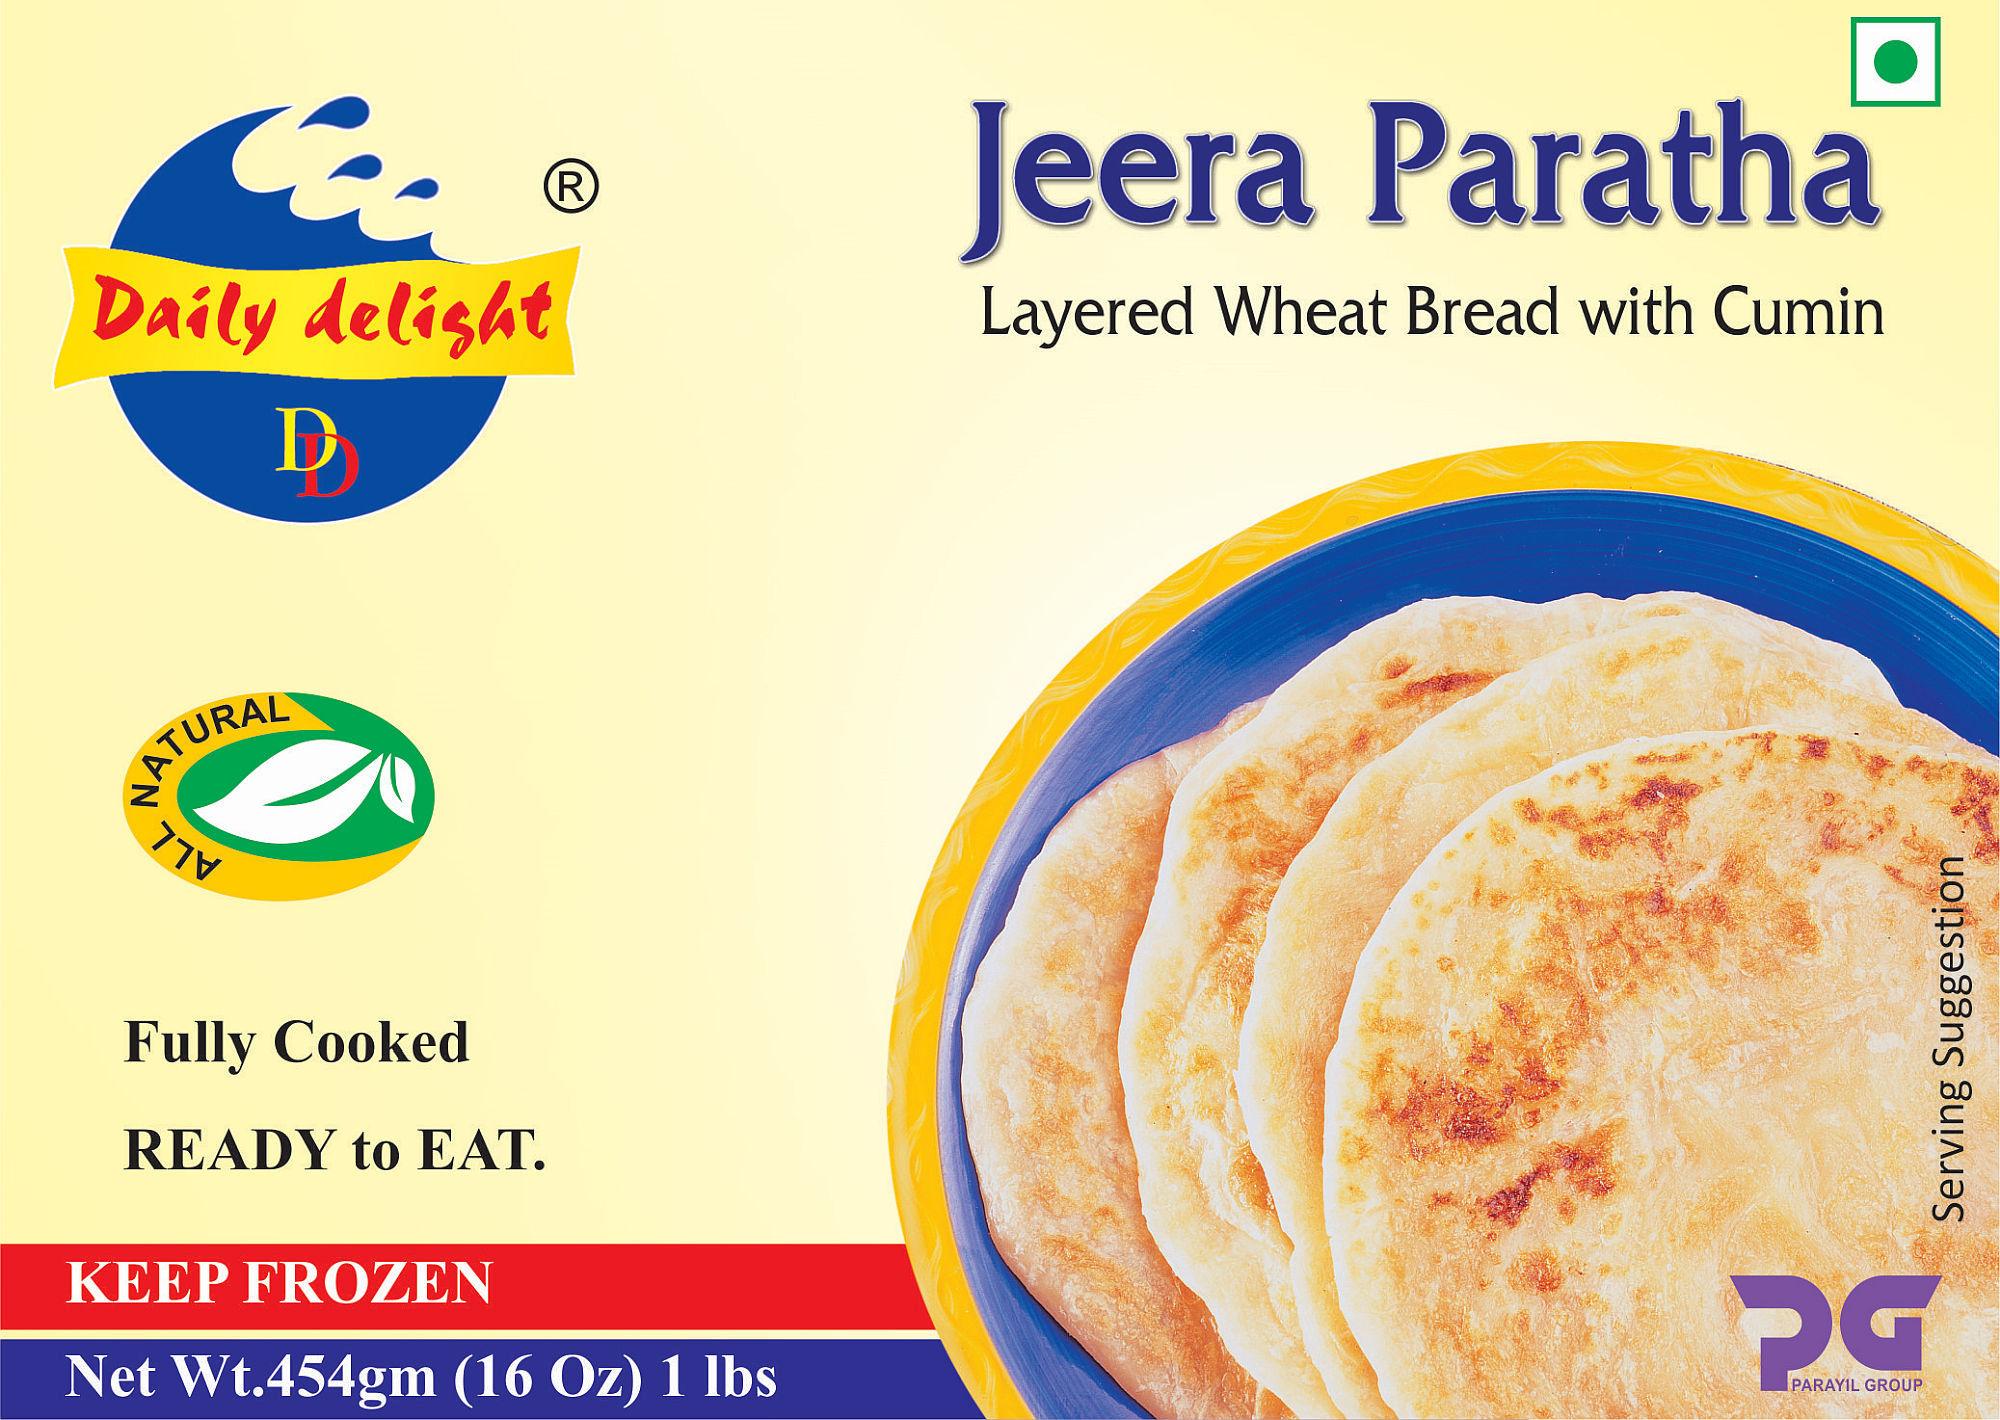 Daily Delight Jeera Paratha